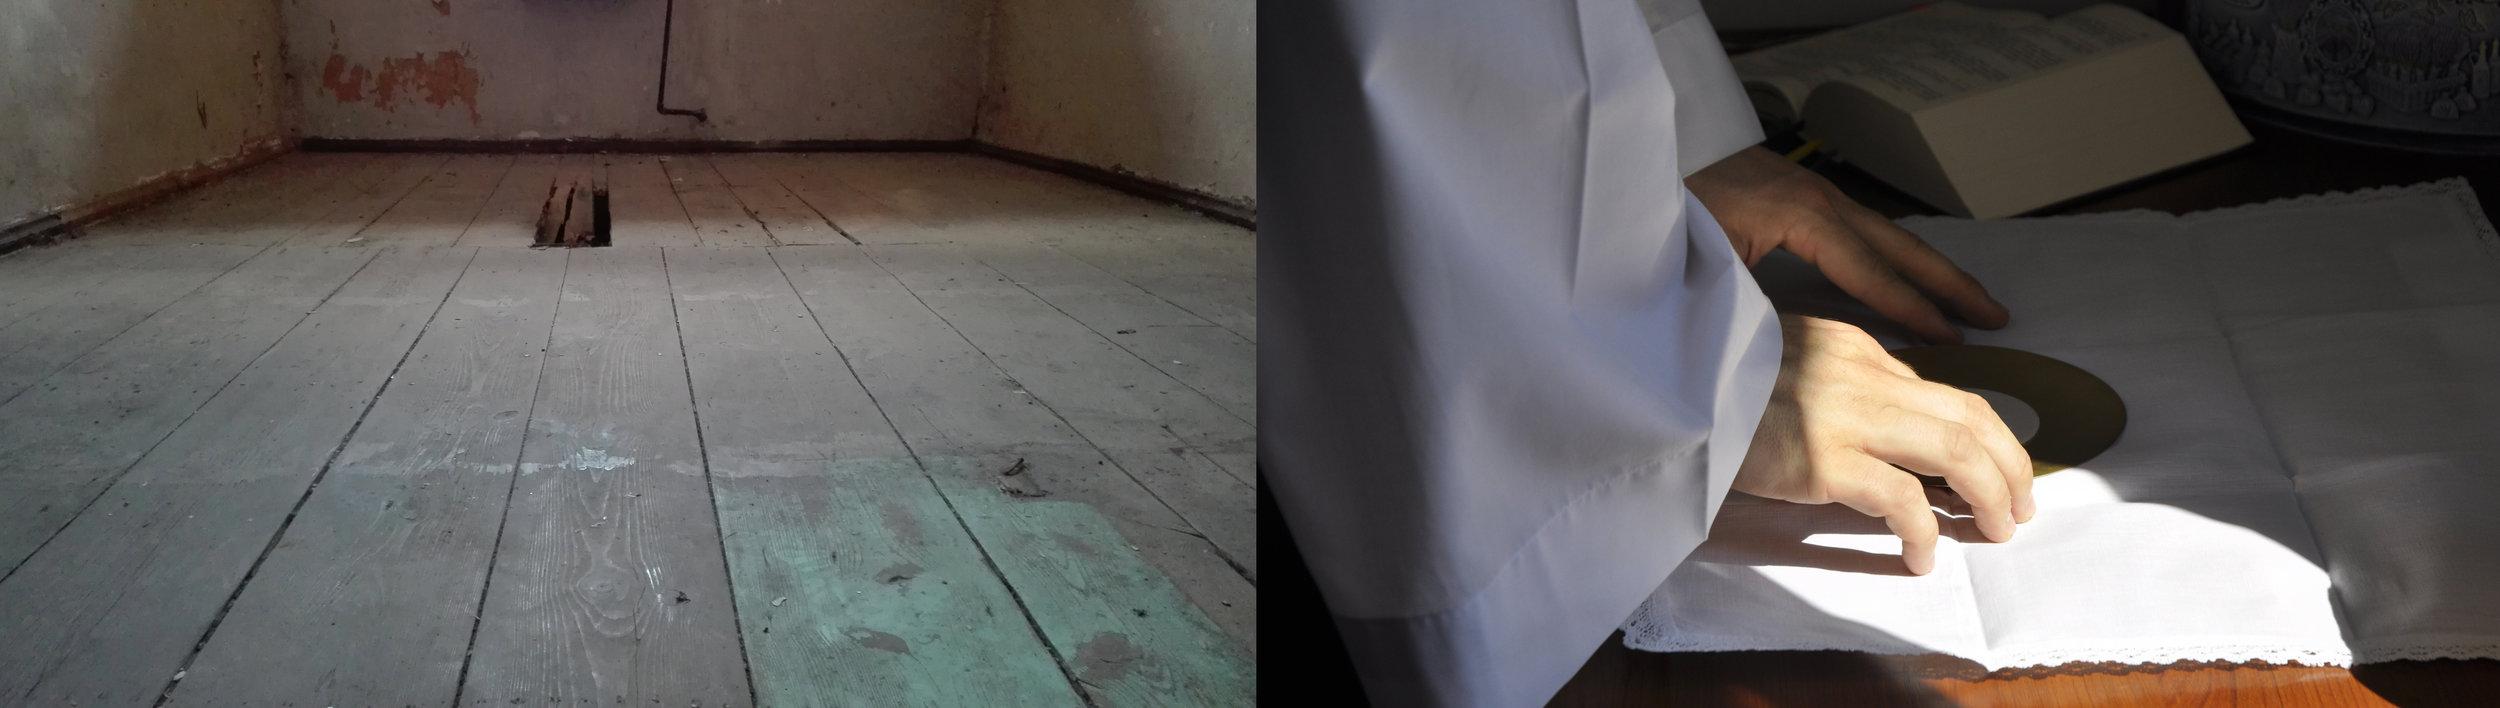 Mateusz Grymek, site-specific installation, 2016